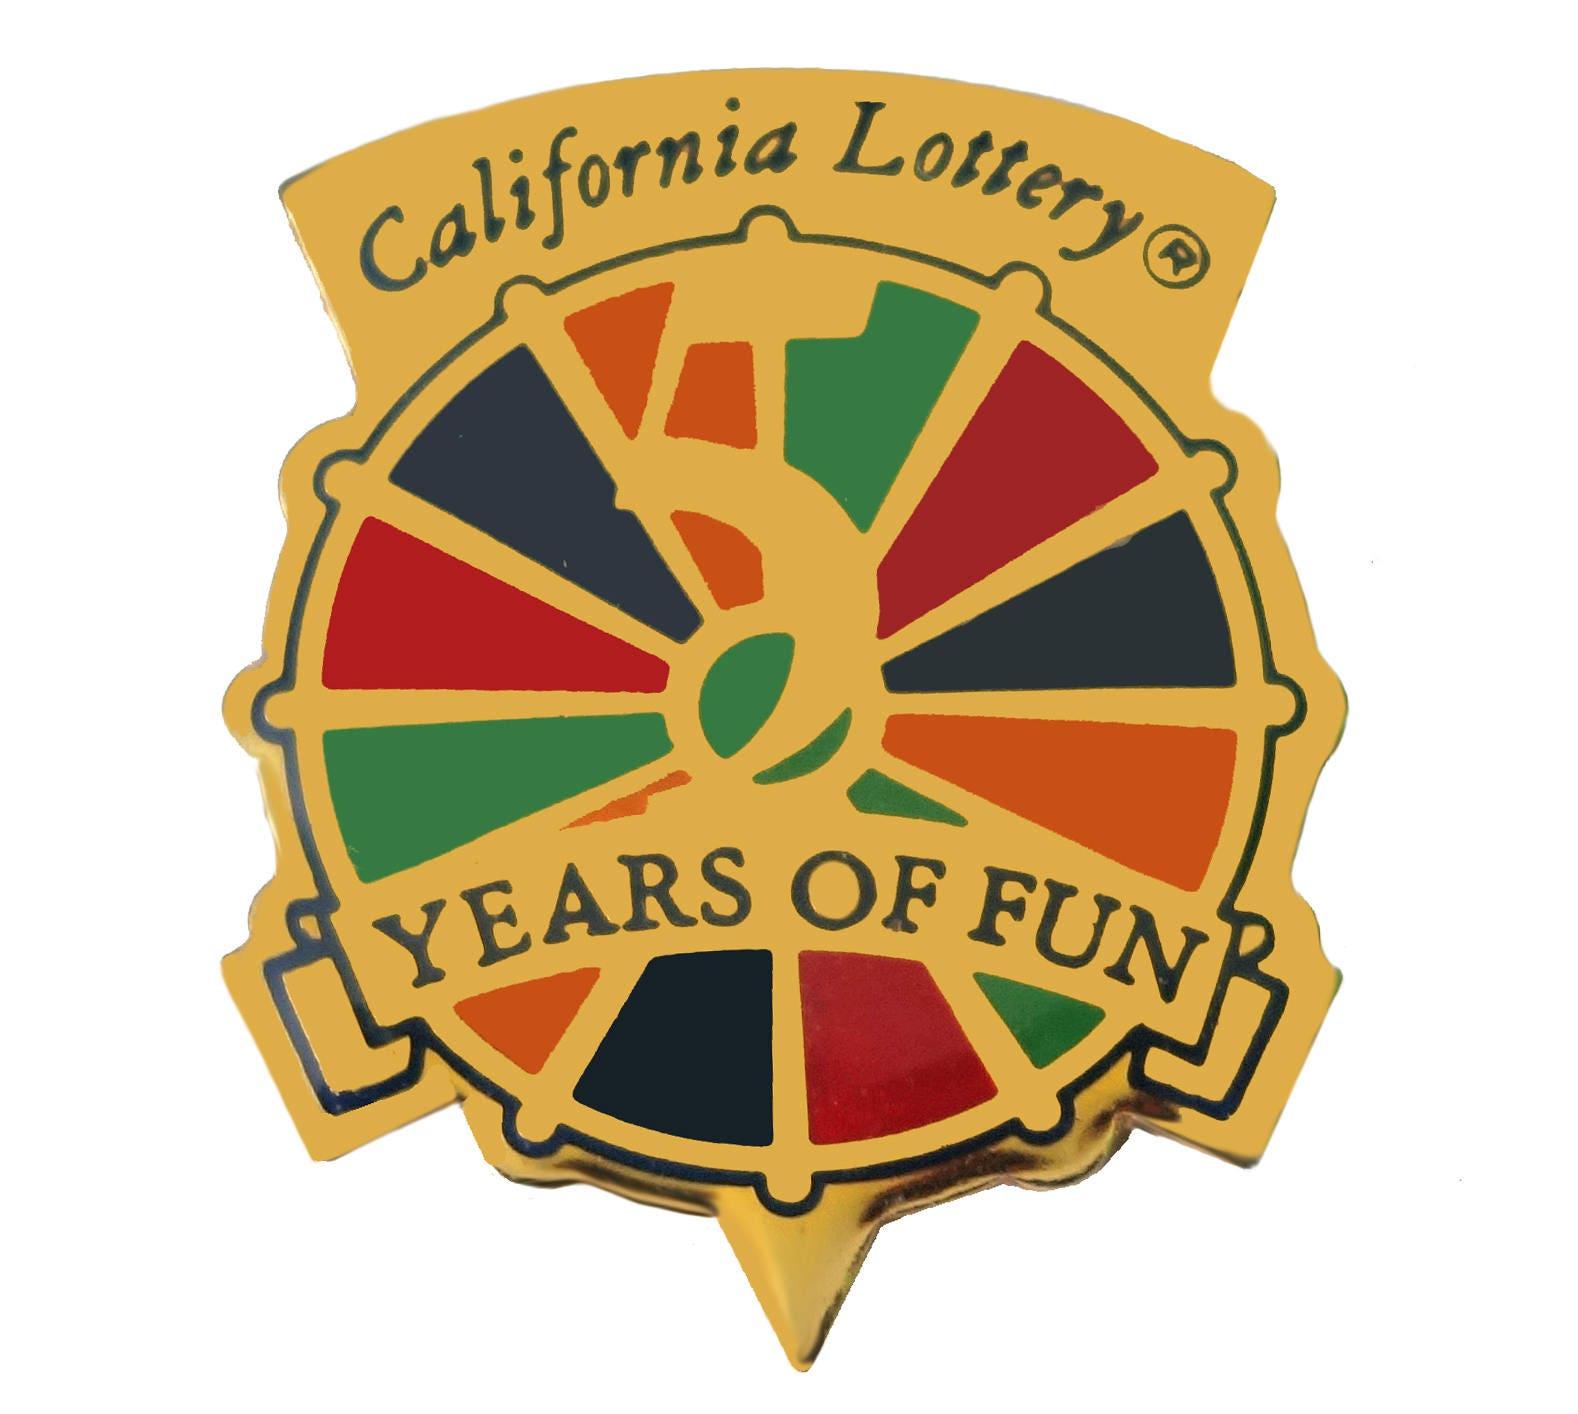 CALIFORNIA STATE LOTTERY vintage enamel pin lapel badge brooch gift